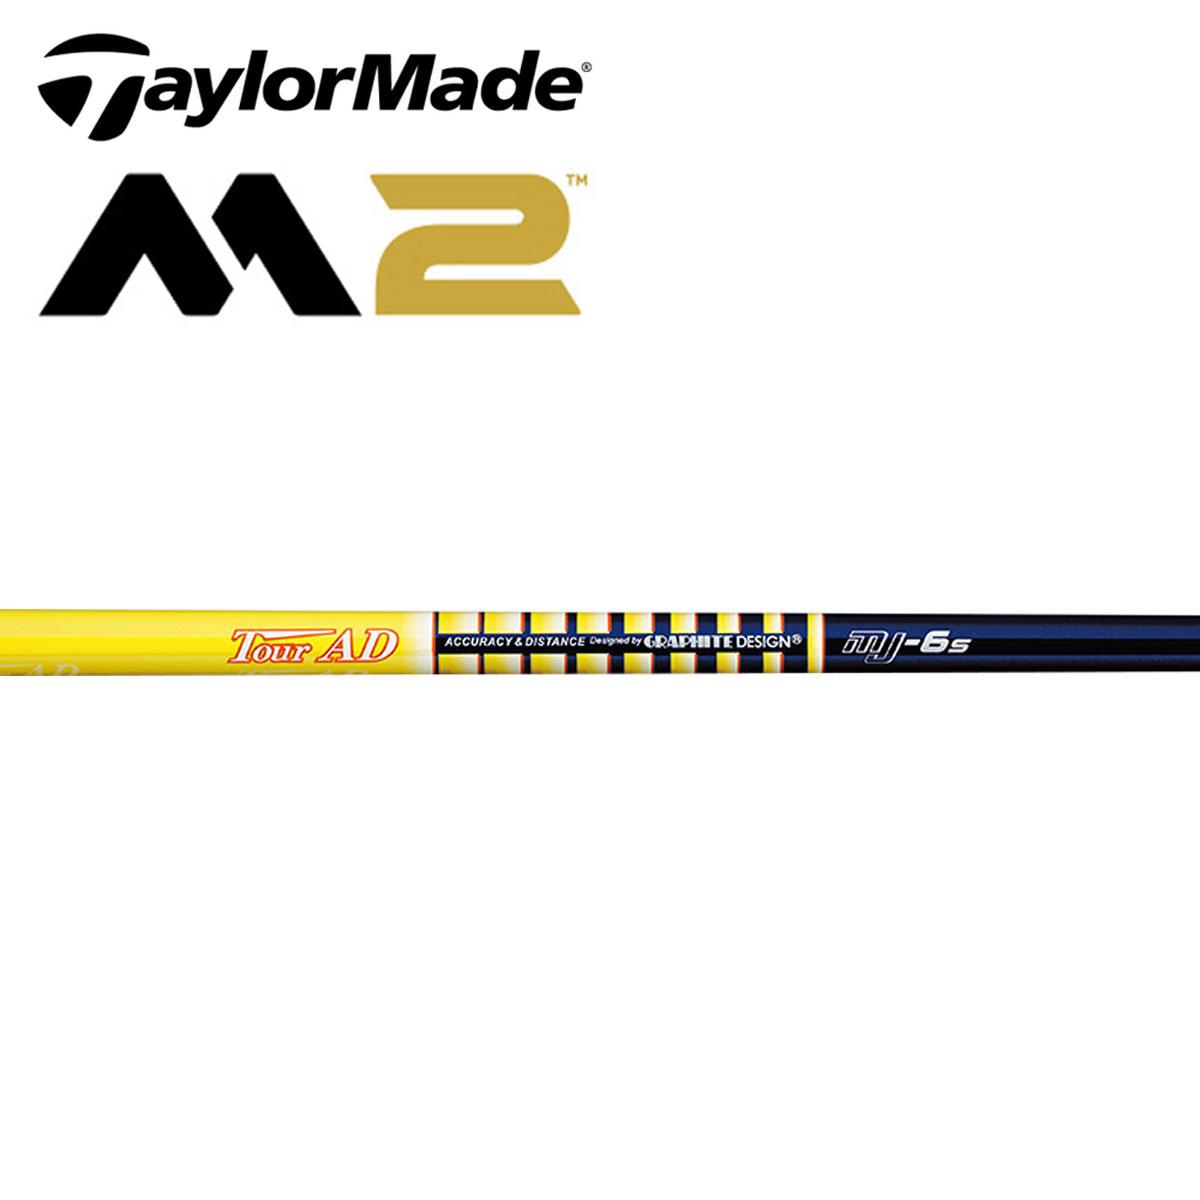 Tour AD MJシリーズ M2 ドライバーロフト9.5度用スリーブ付きシャフト 2016年モデル【テーラーメイド専用】